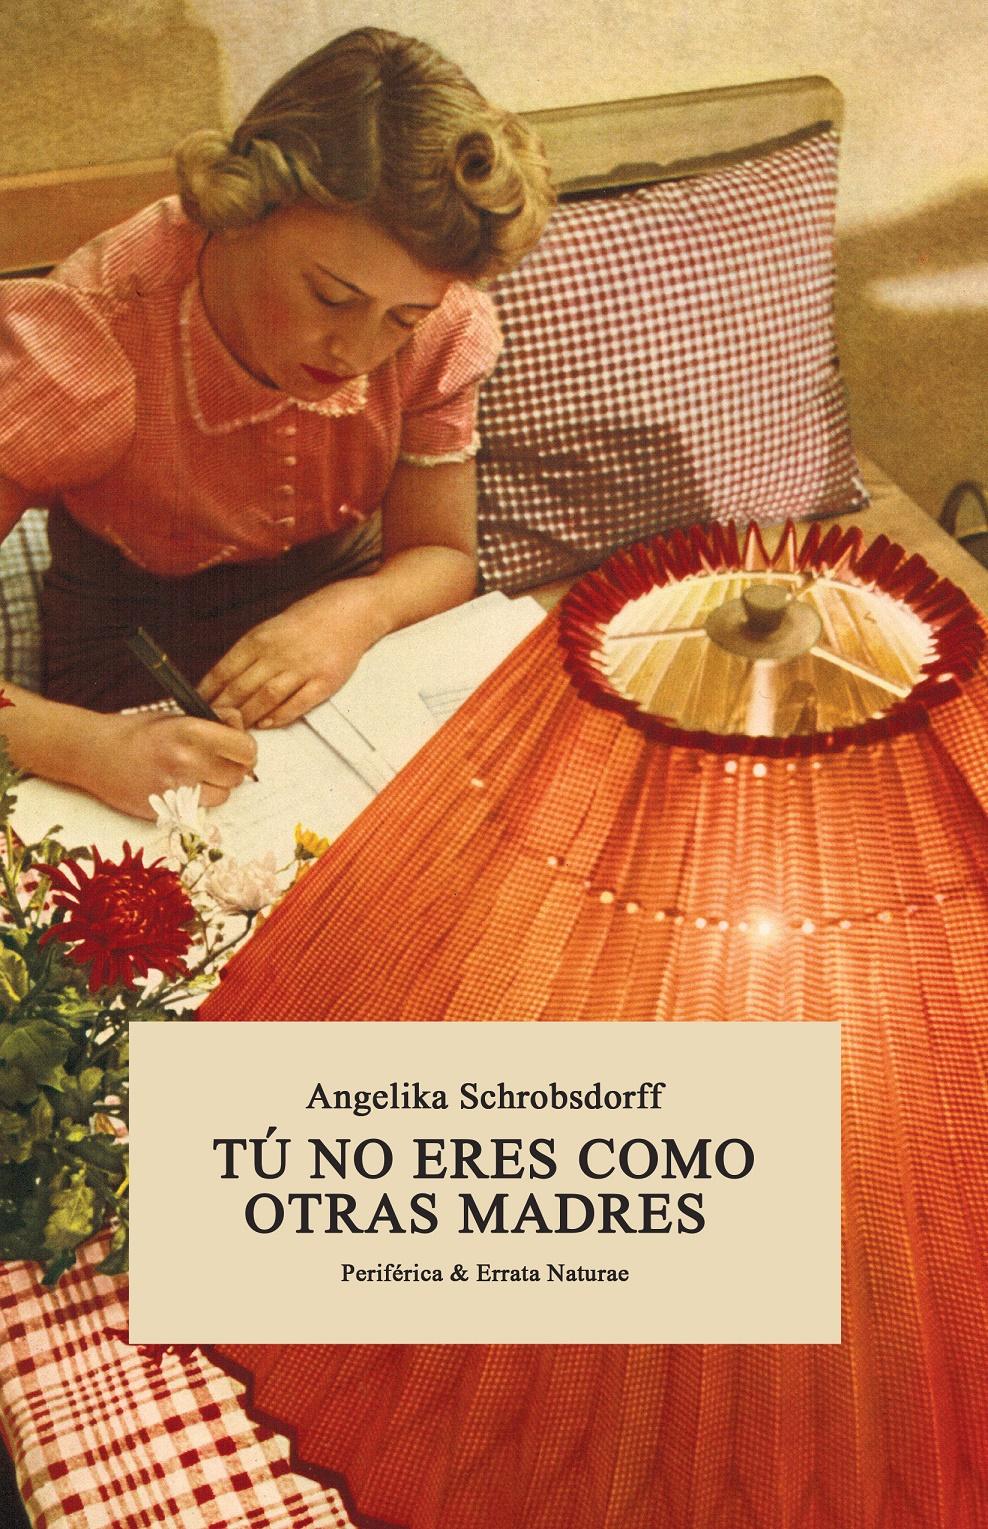 http://laantiguabiblos.blogspot.com.es/2017/01/tu-no-eres-como-otras-madres-angelika.html